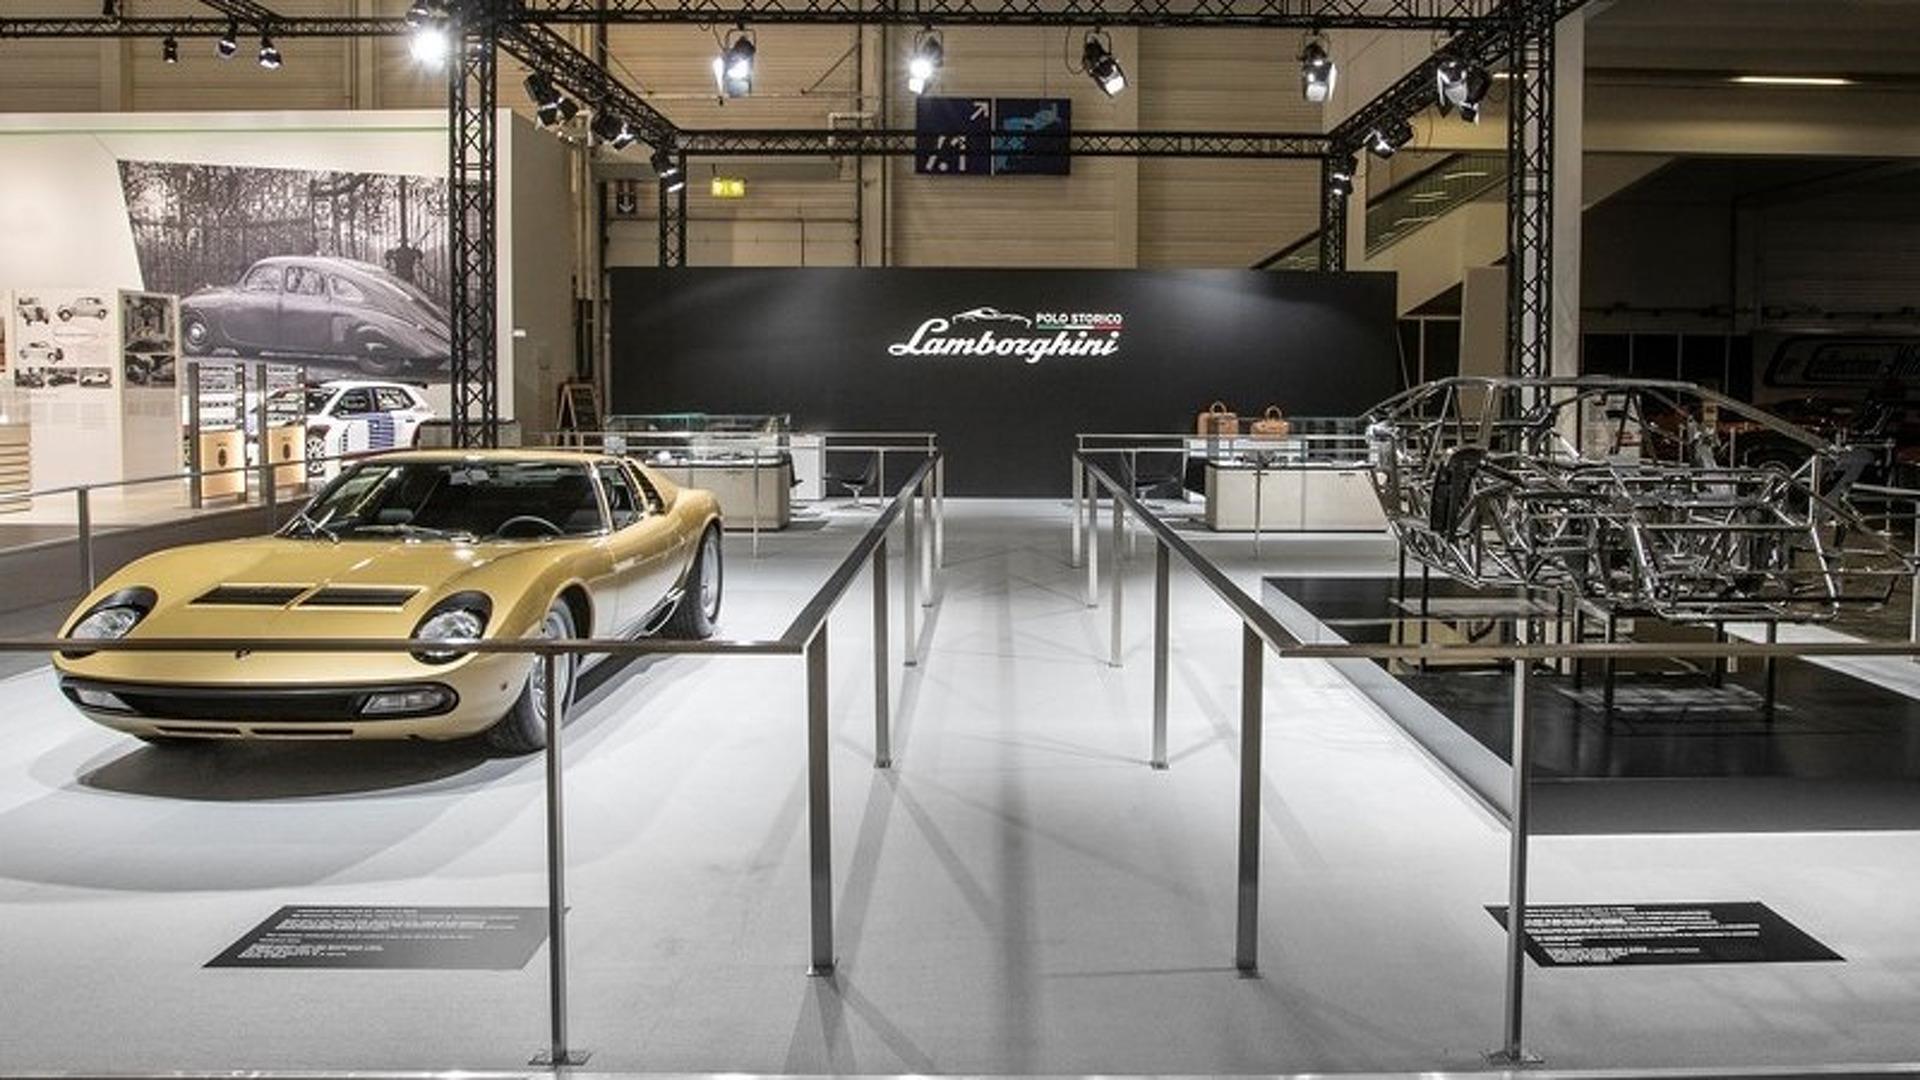 Lamborghini_Miura_SV_restored_10